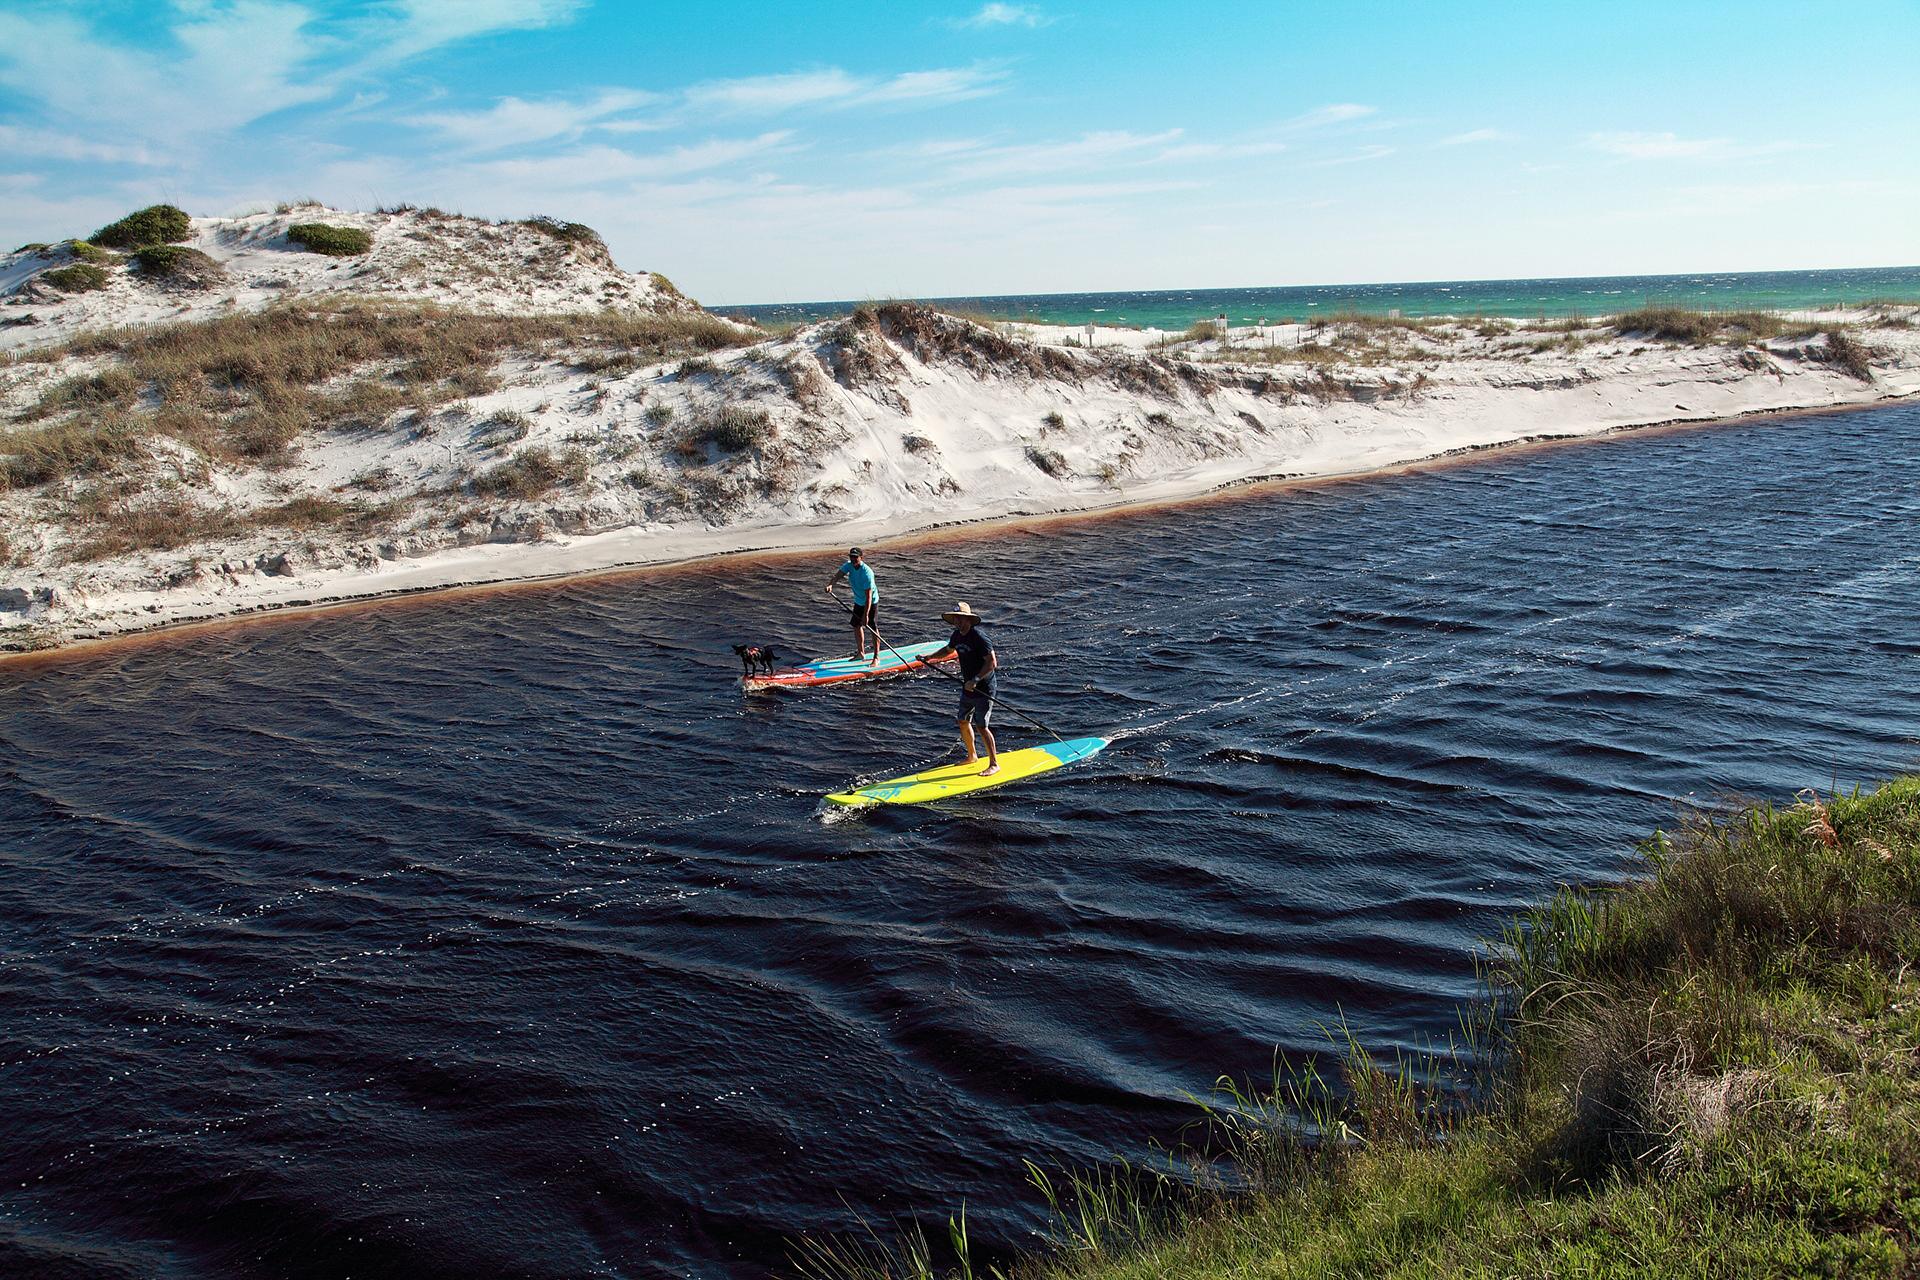 Paddleboarding on Coastal Dune Lakes in South Walton, Florida; Courtesy of Visit South Walton